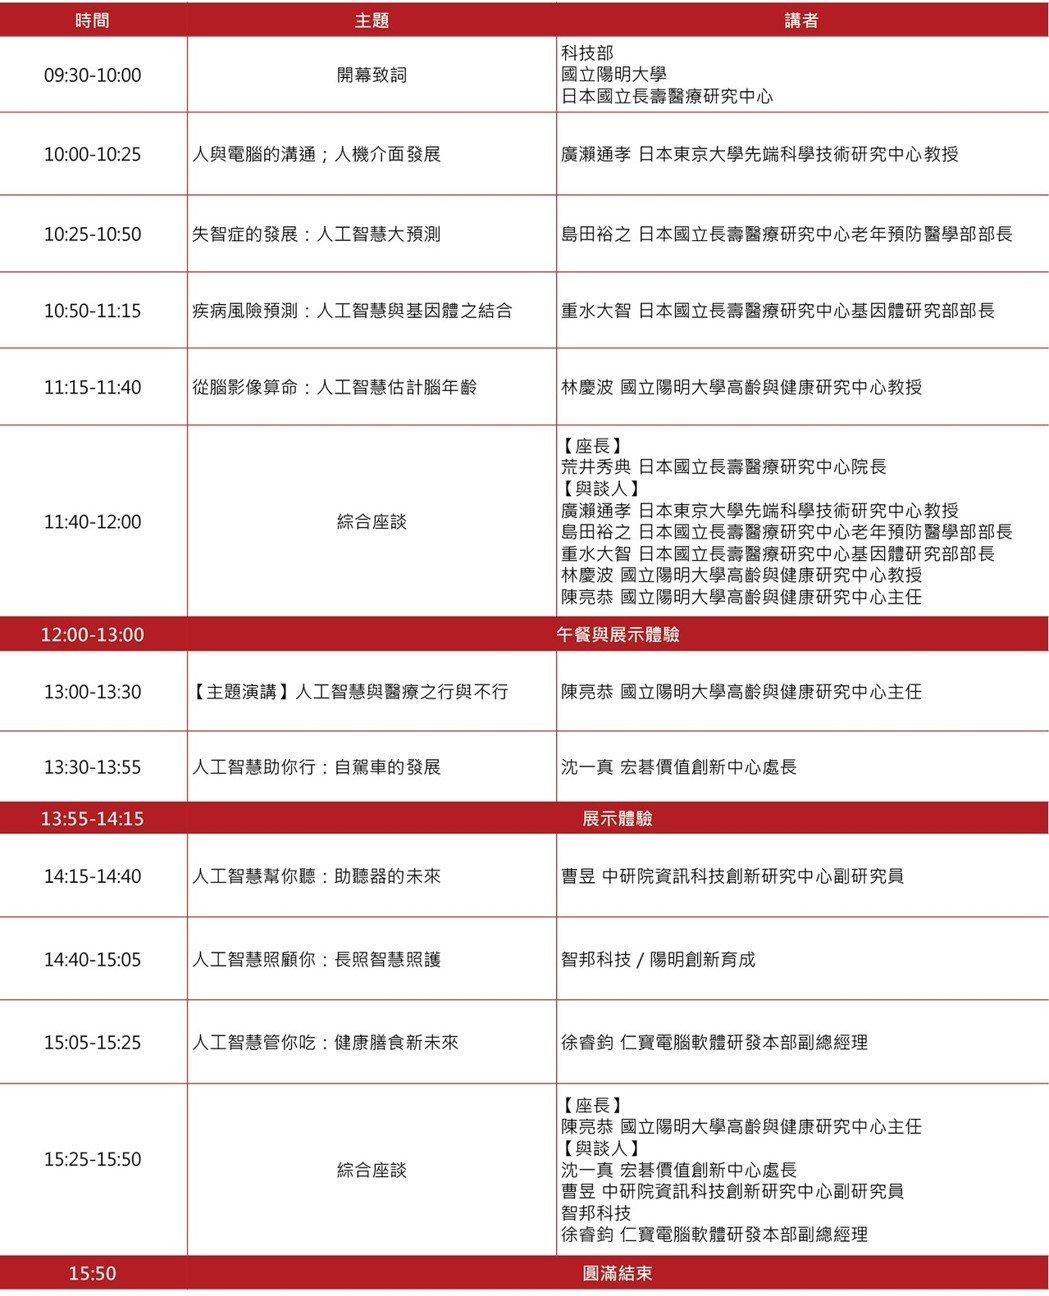 2018-07-23-udn_ai_agenda